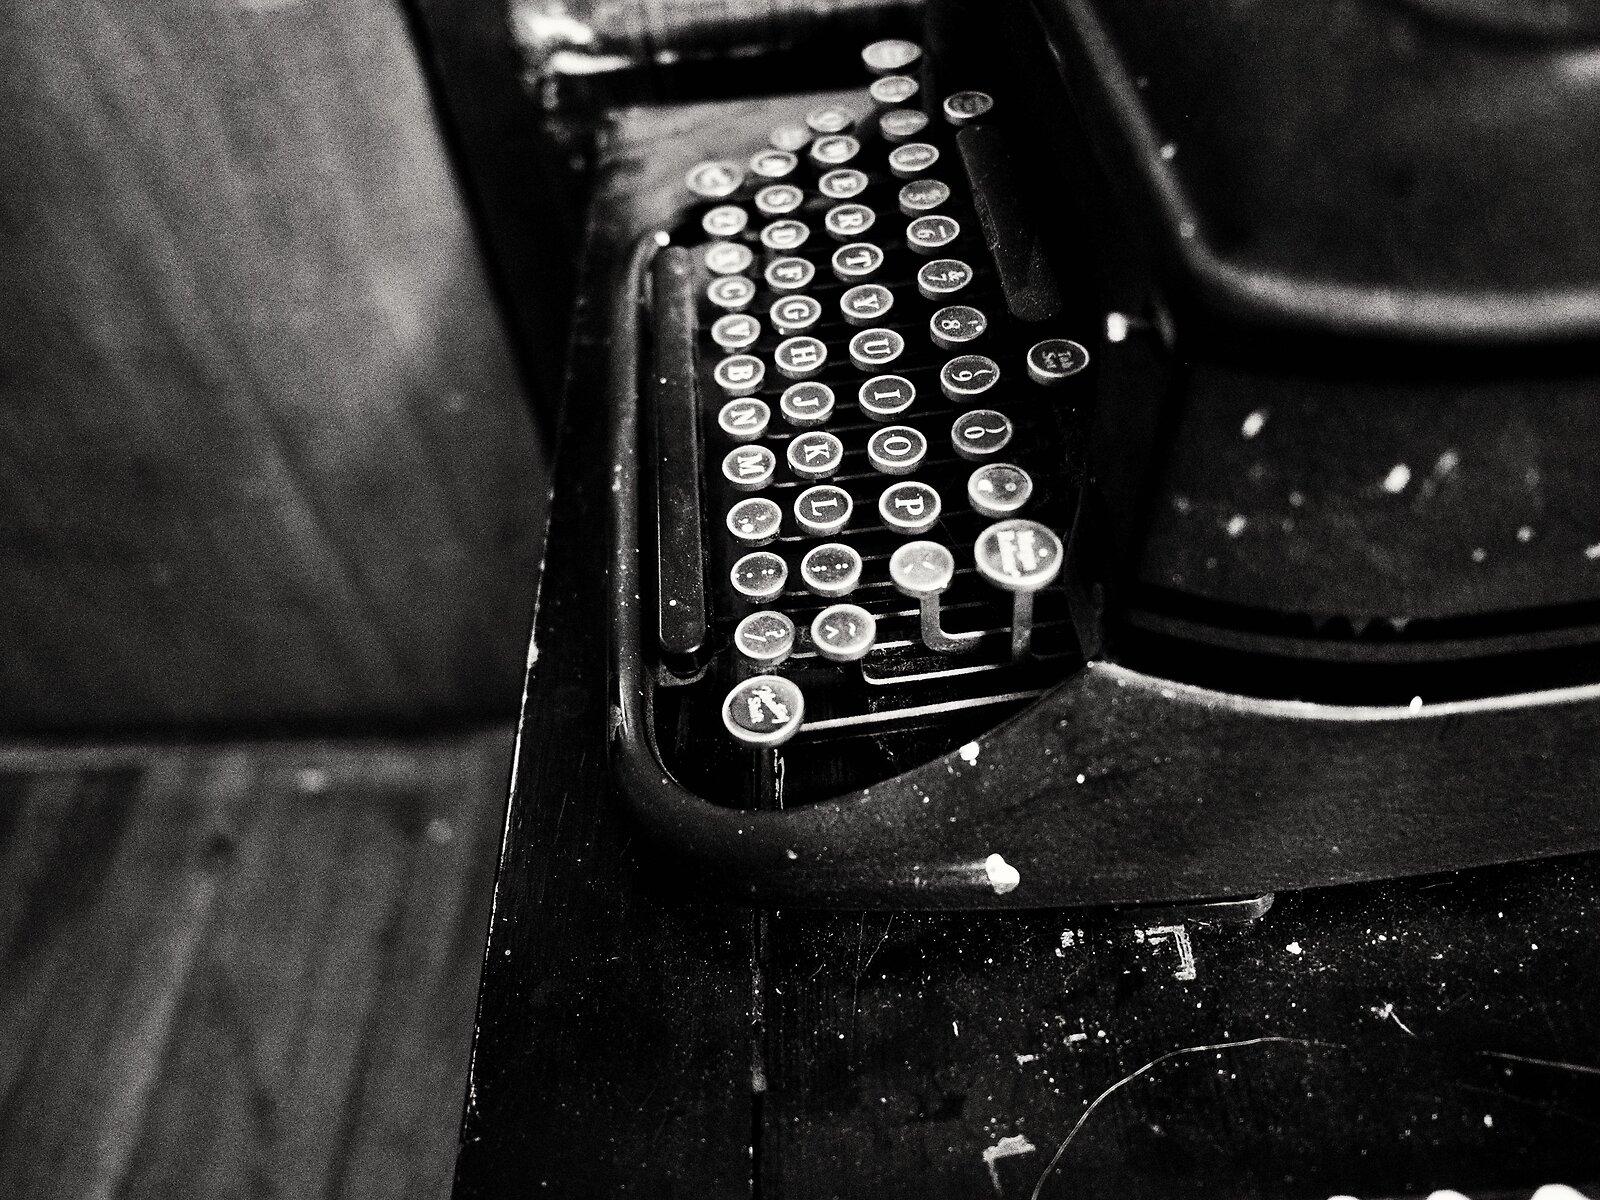 PenF_Jan24_21_mono_Smith-Corona_keyboard.jpg